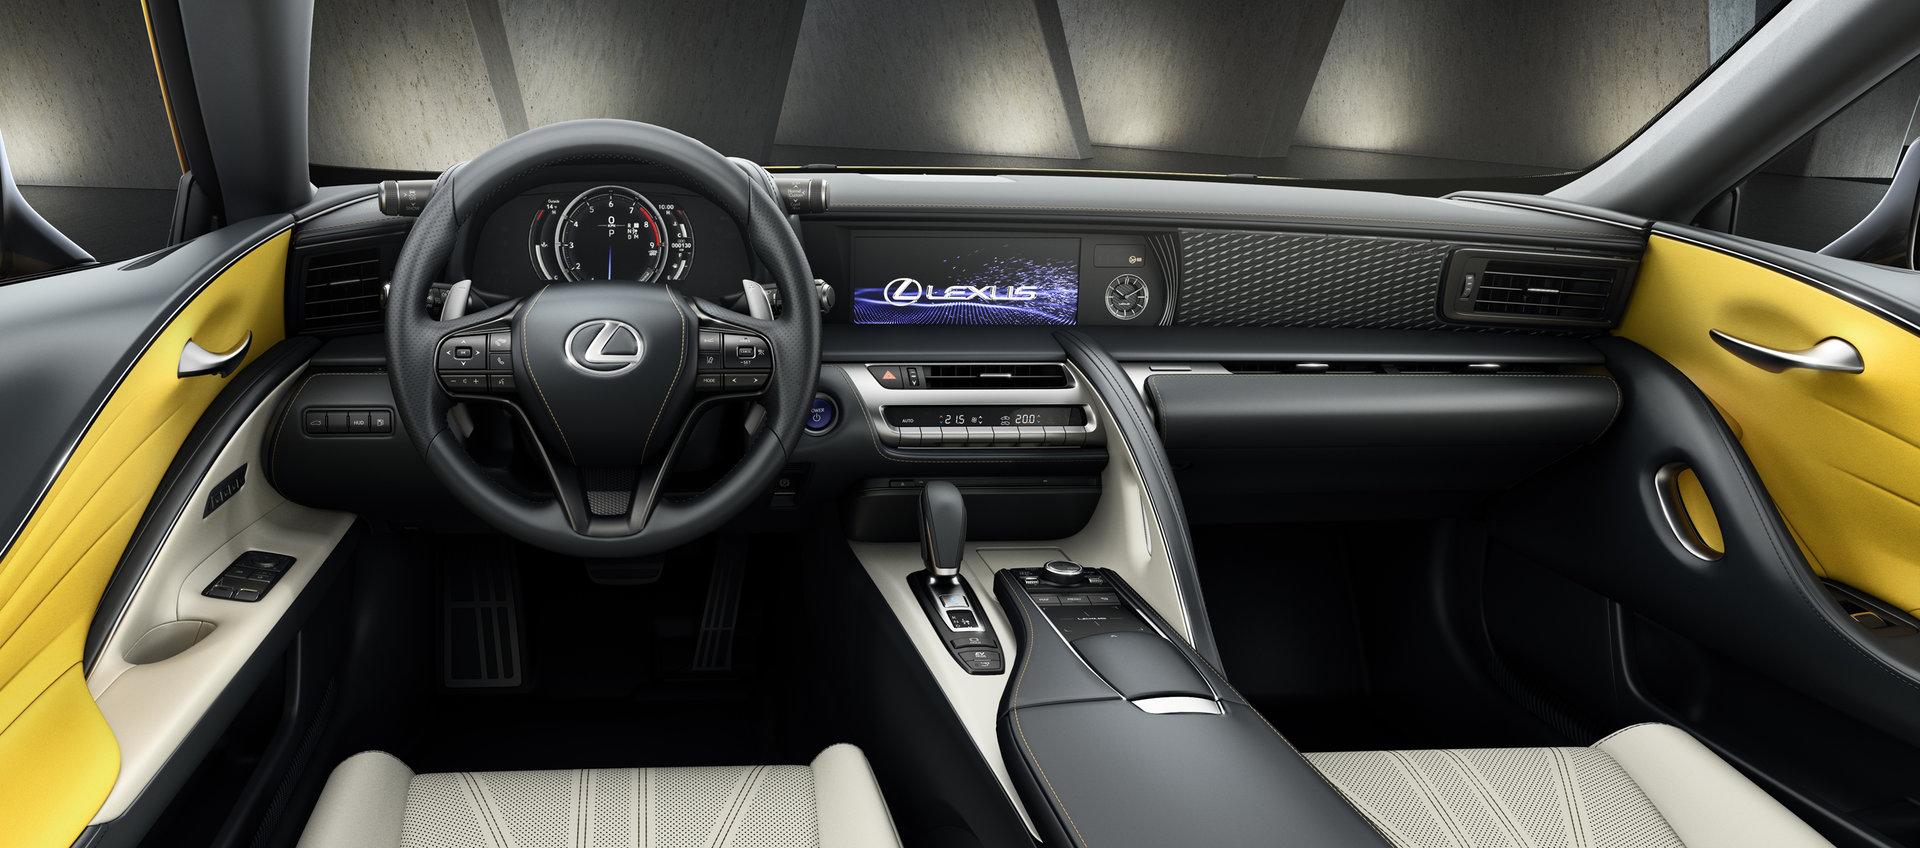 Lexus Lc Yellow Edition 2